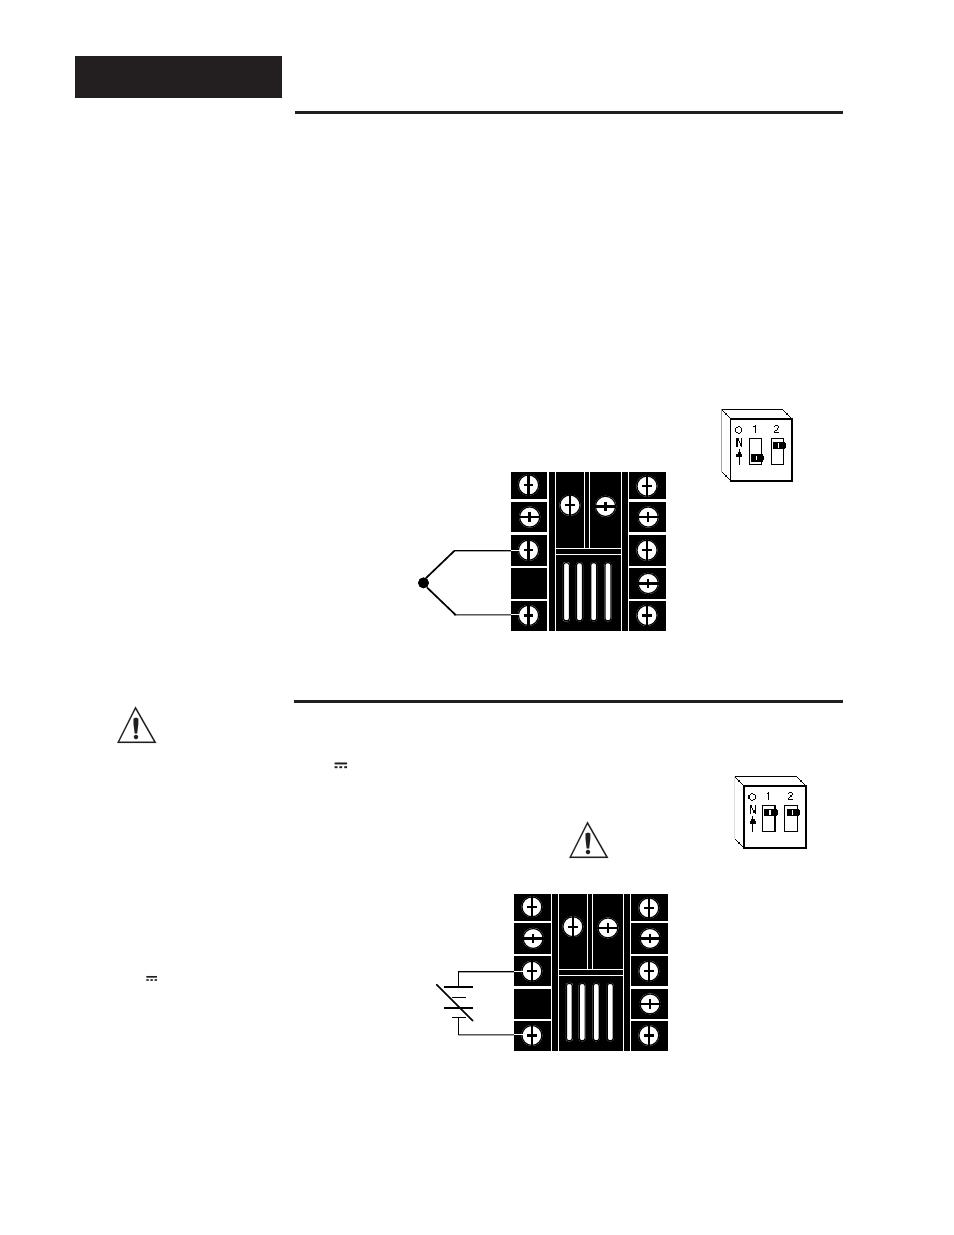 medium resolution of input wiring sensor installation guidelines thermocouple input thermocouple sensor input wiring dc